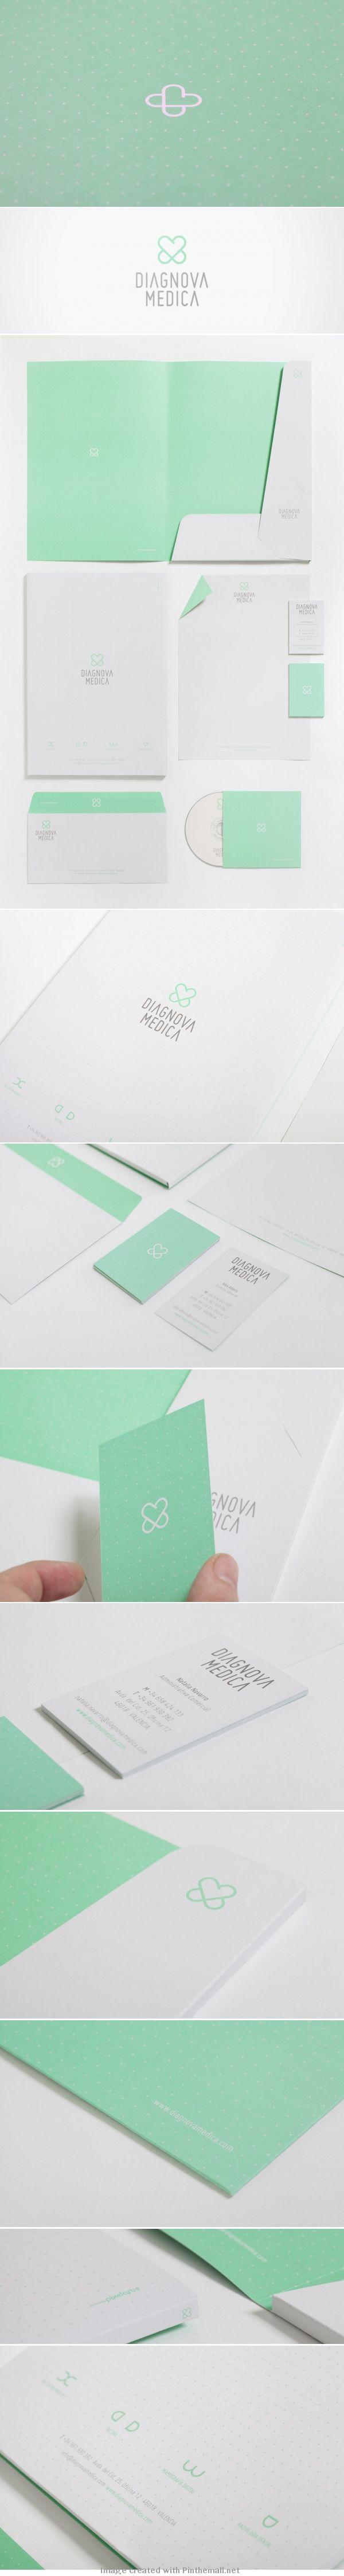 corporate business branding visual identity design card letter head brochure